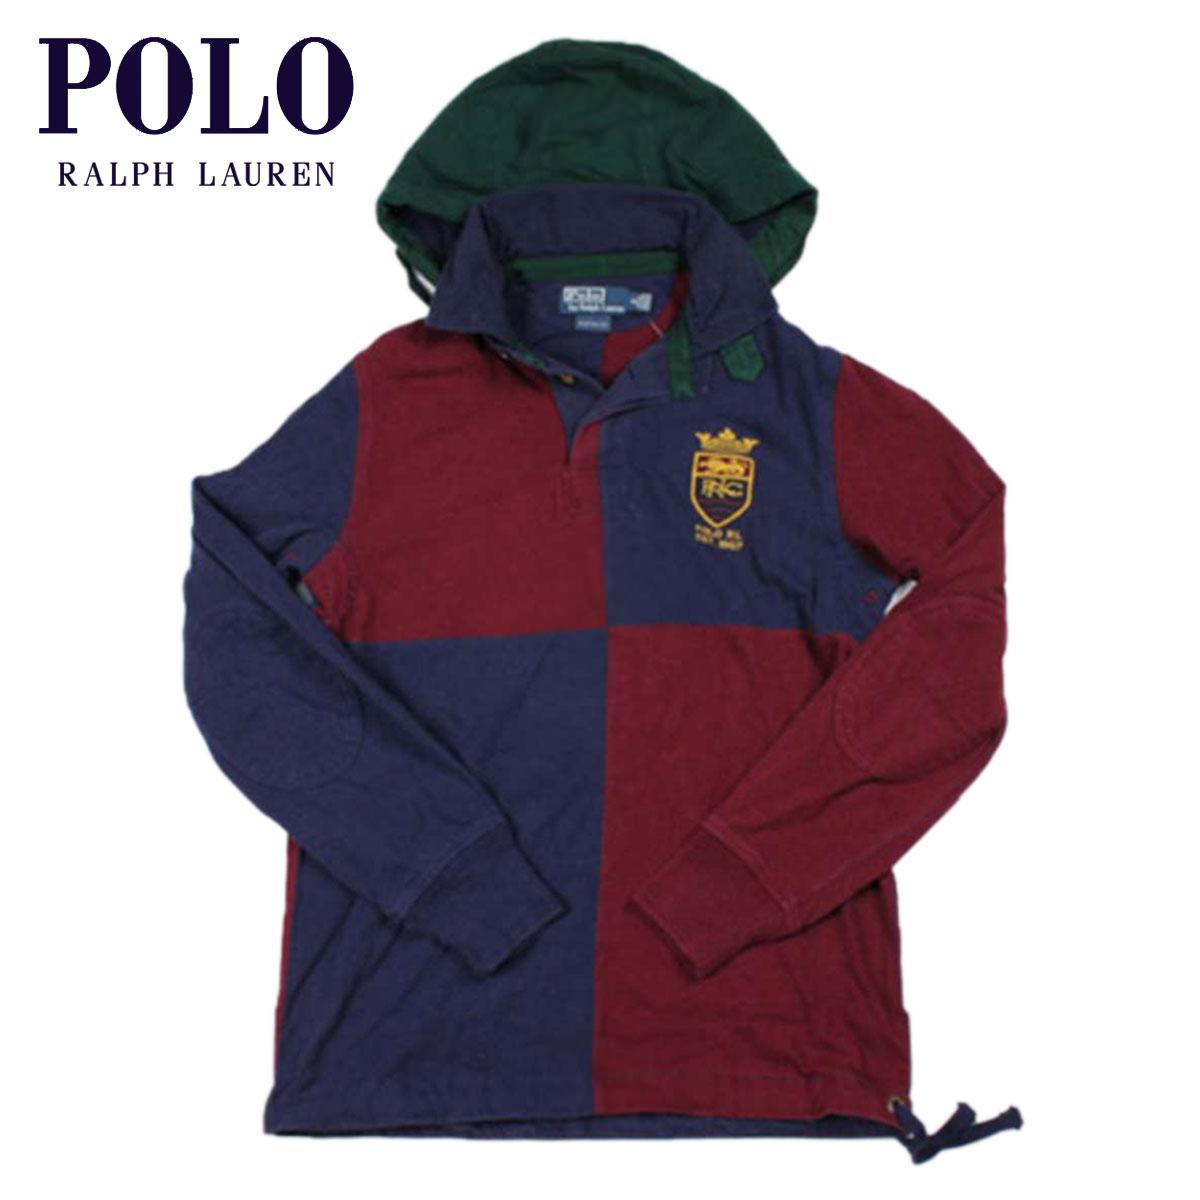 2e365915 Polo Ralph Lauren POLO RALPH LAUREN genuine mens pullover Parker Burgundy  size: P14Nov15